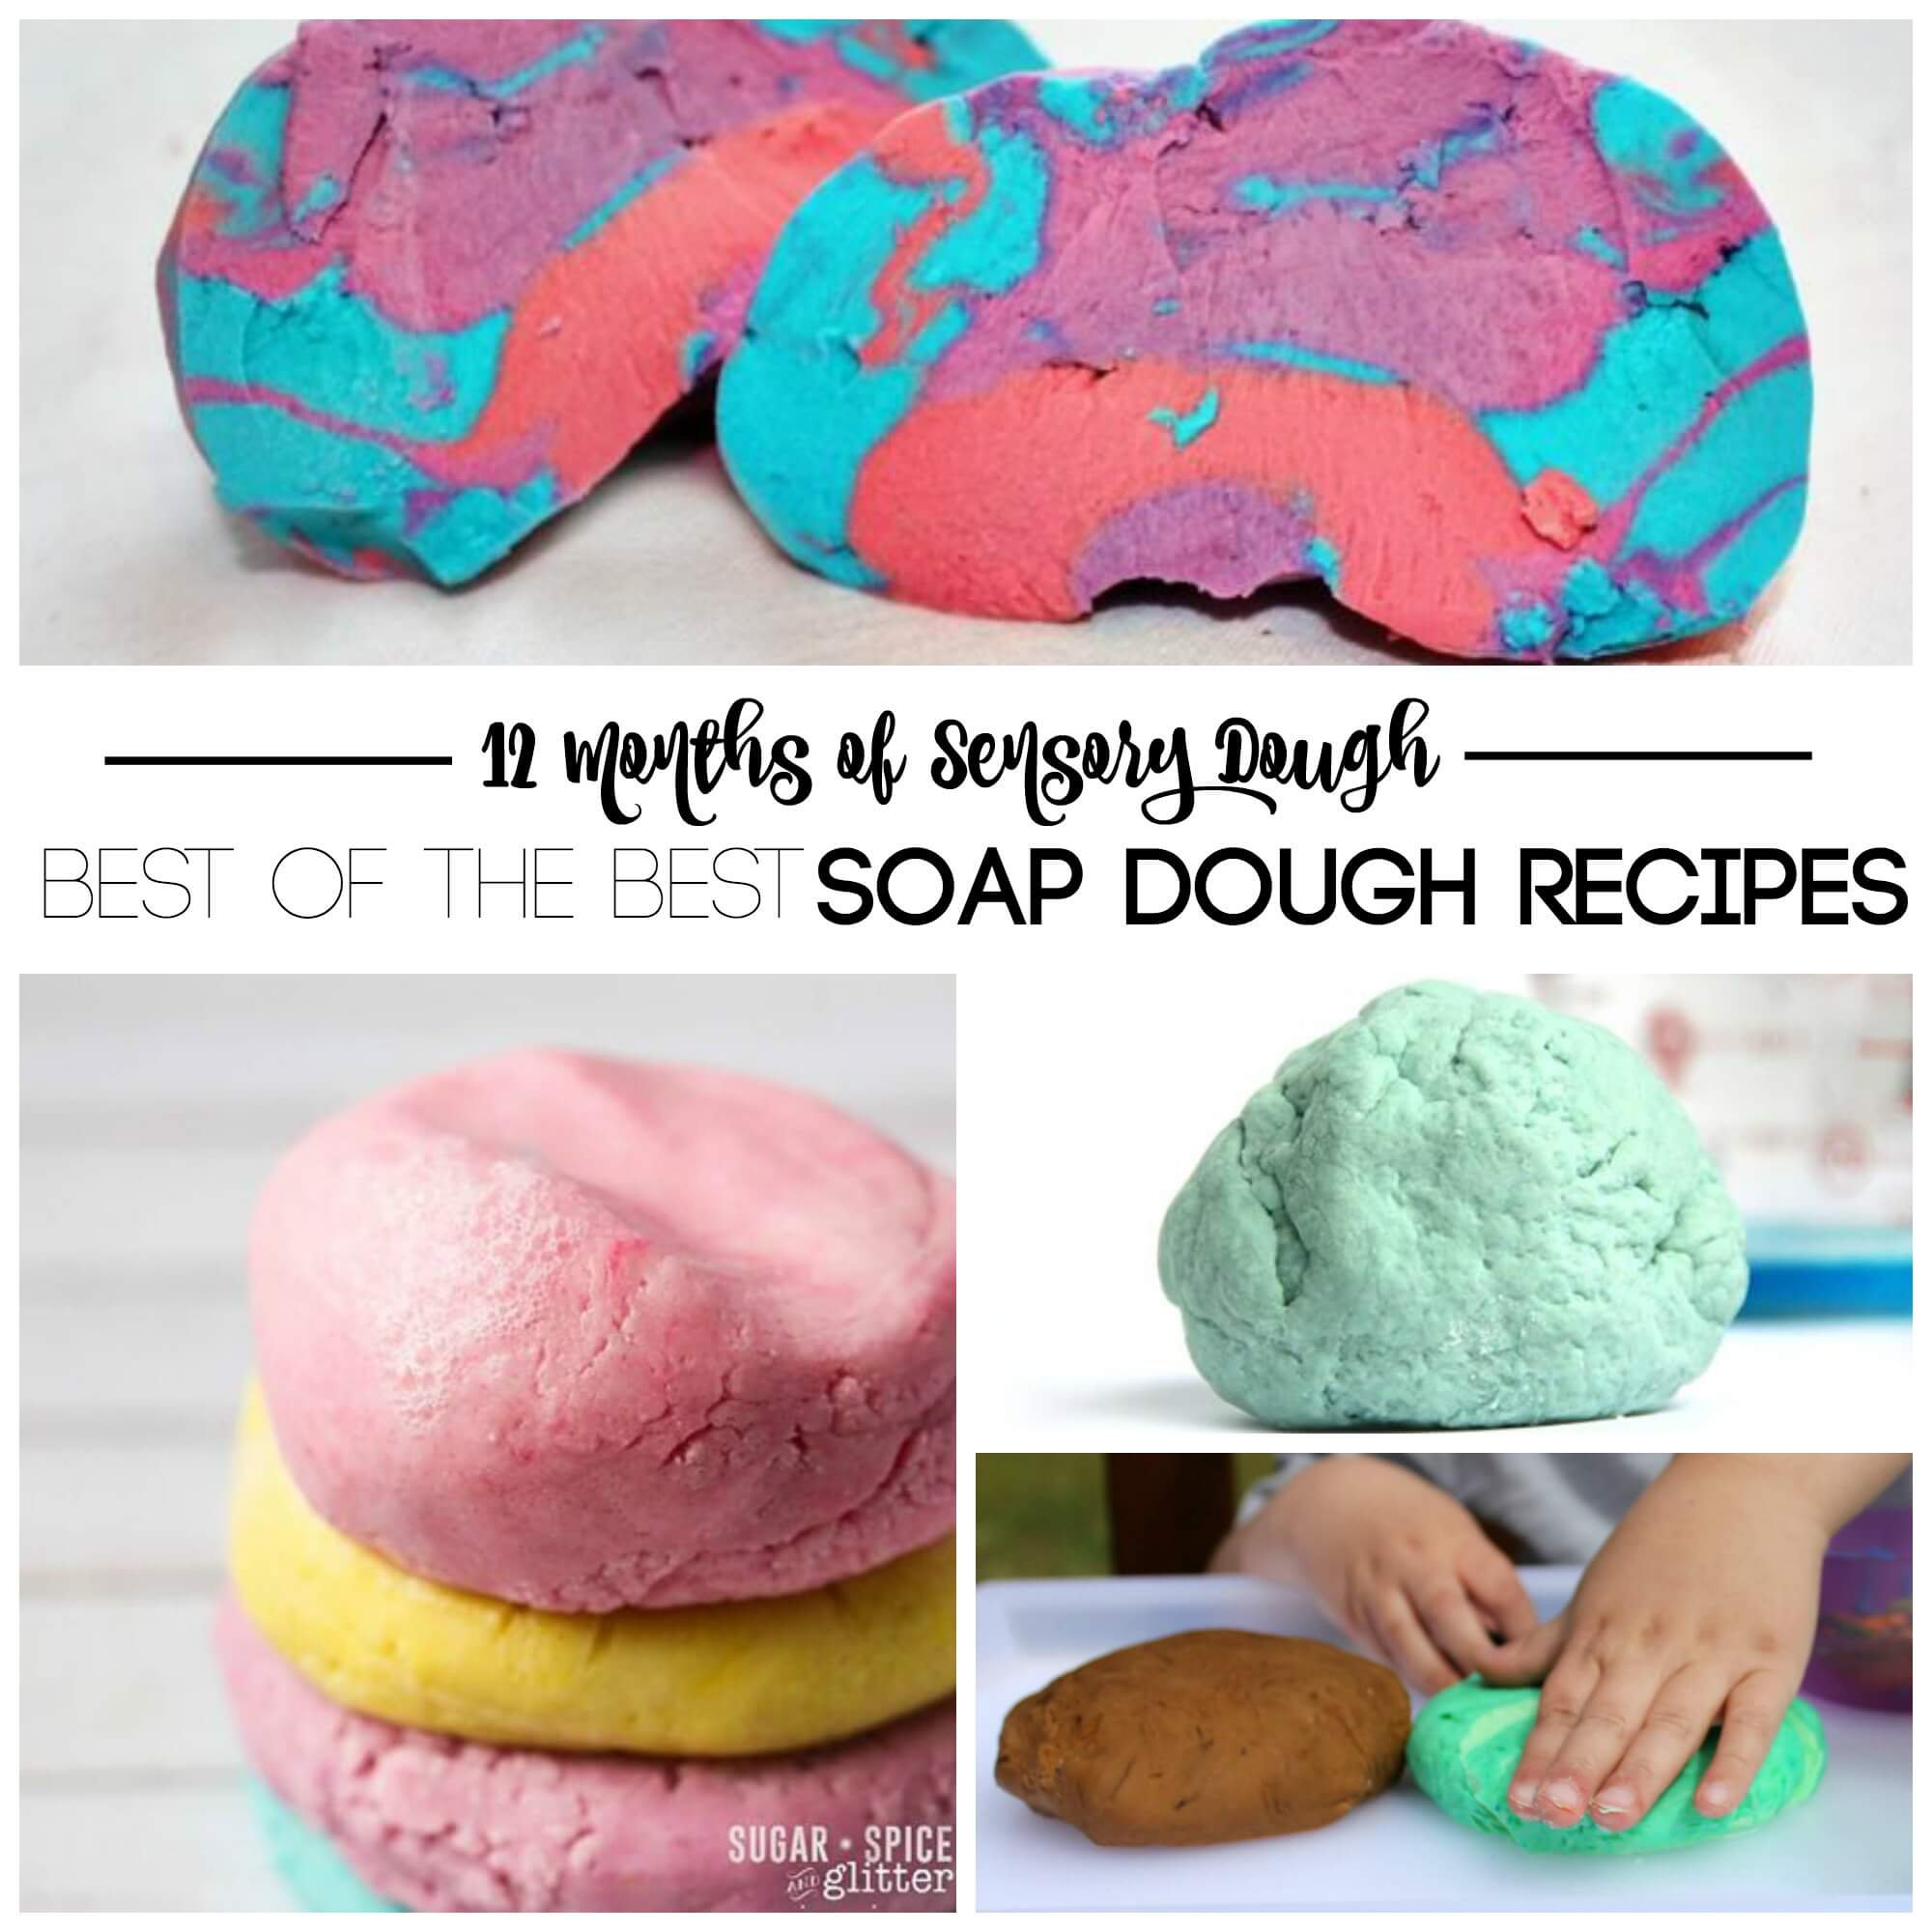 12 months of soap dough recipes